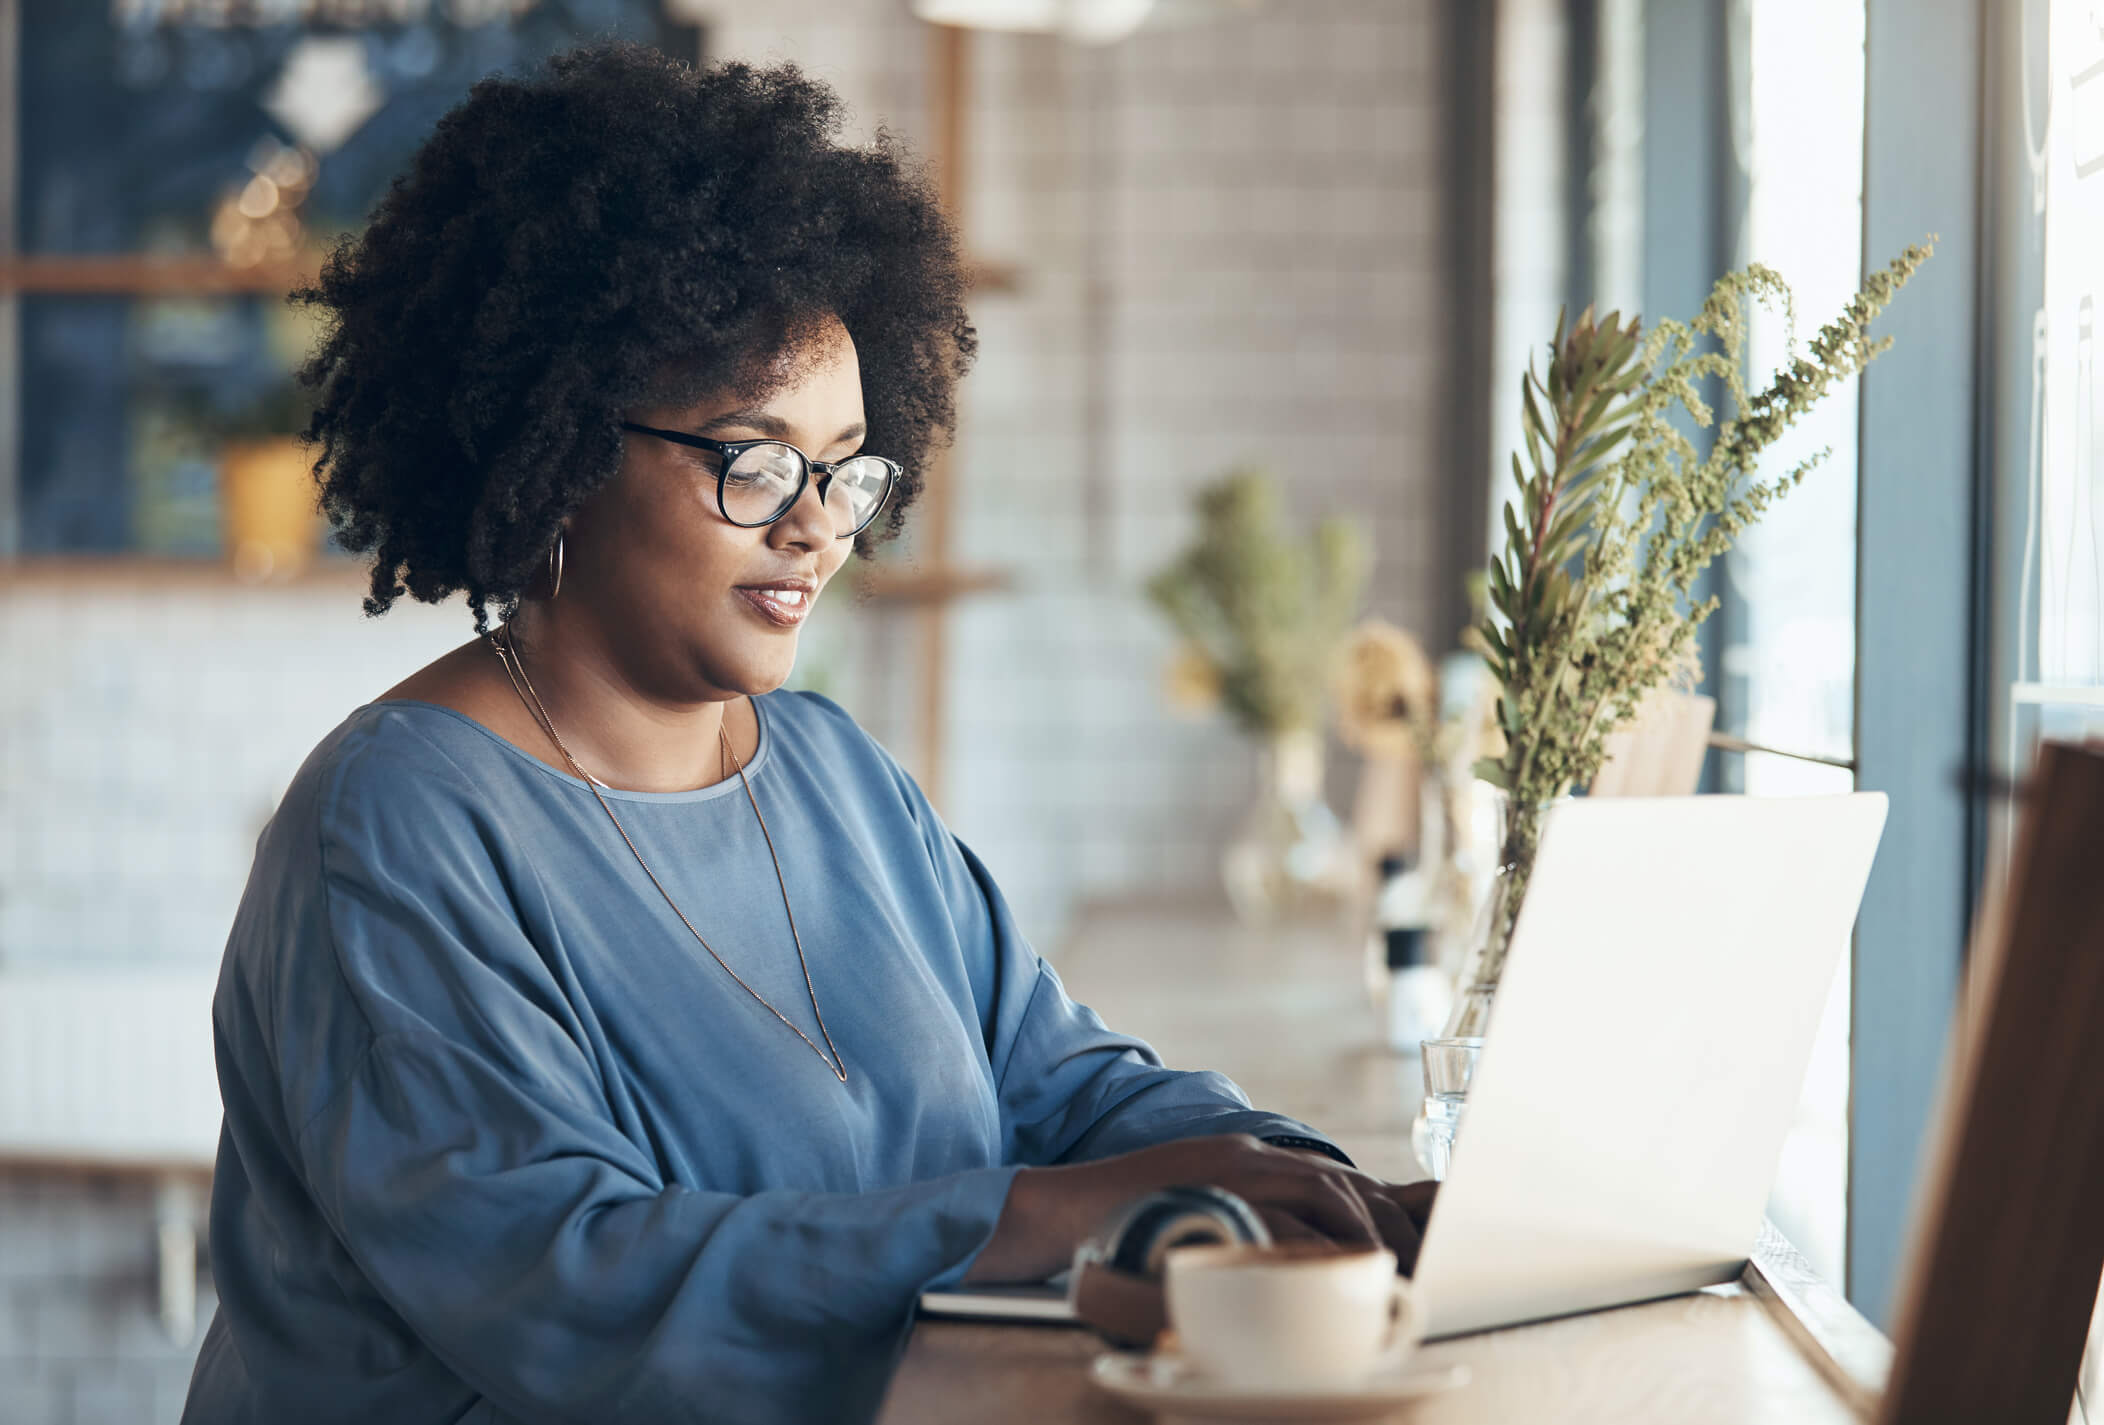 Woman on laptop comparing IPVanish and Norton Secure VPN